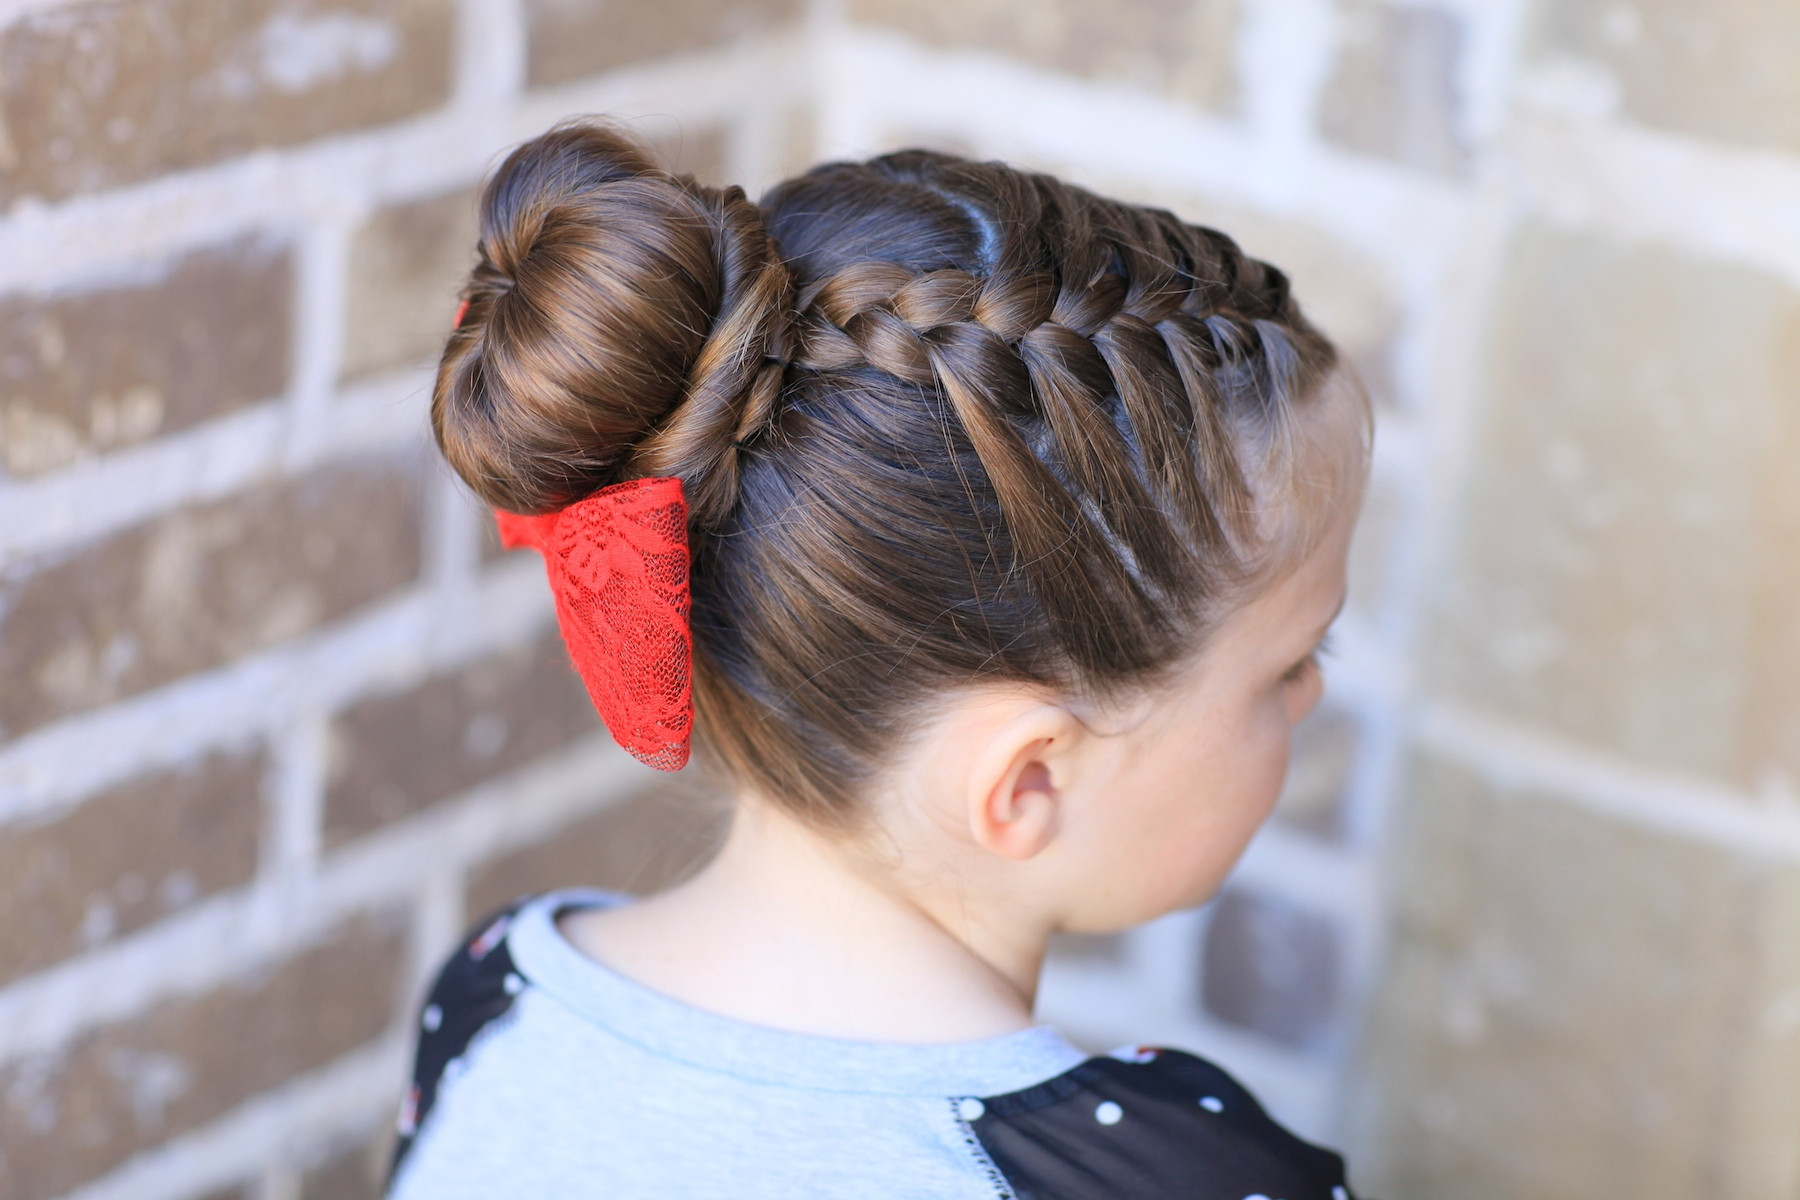 Cute Gymnastics Hairstyles  Cute gymnastics hairstyles for short hair